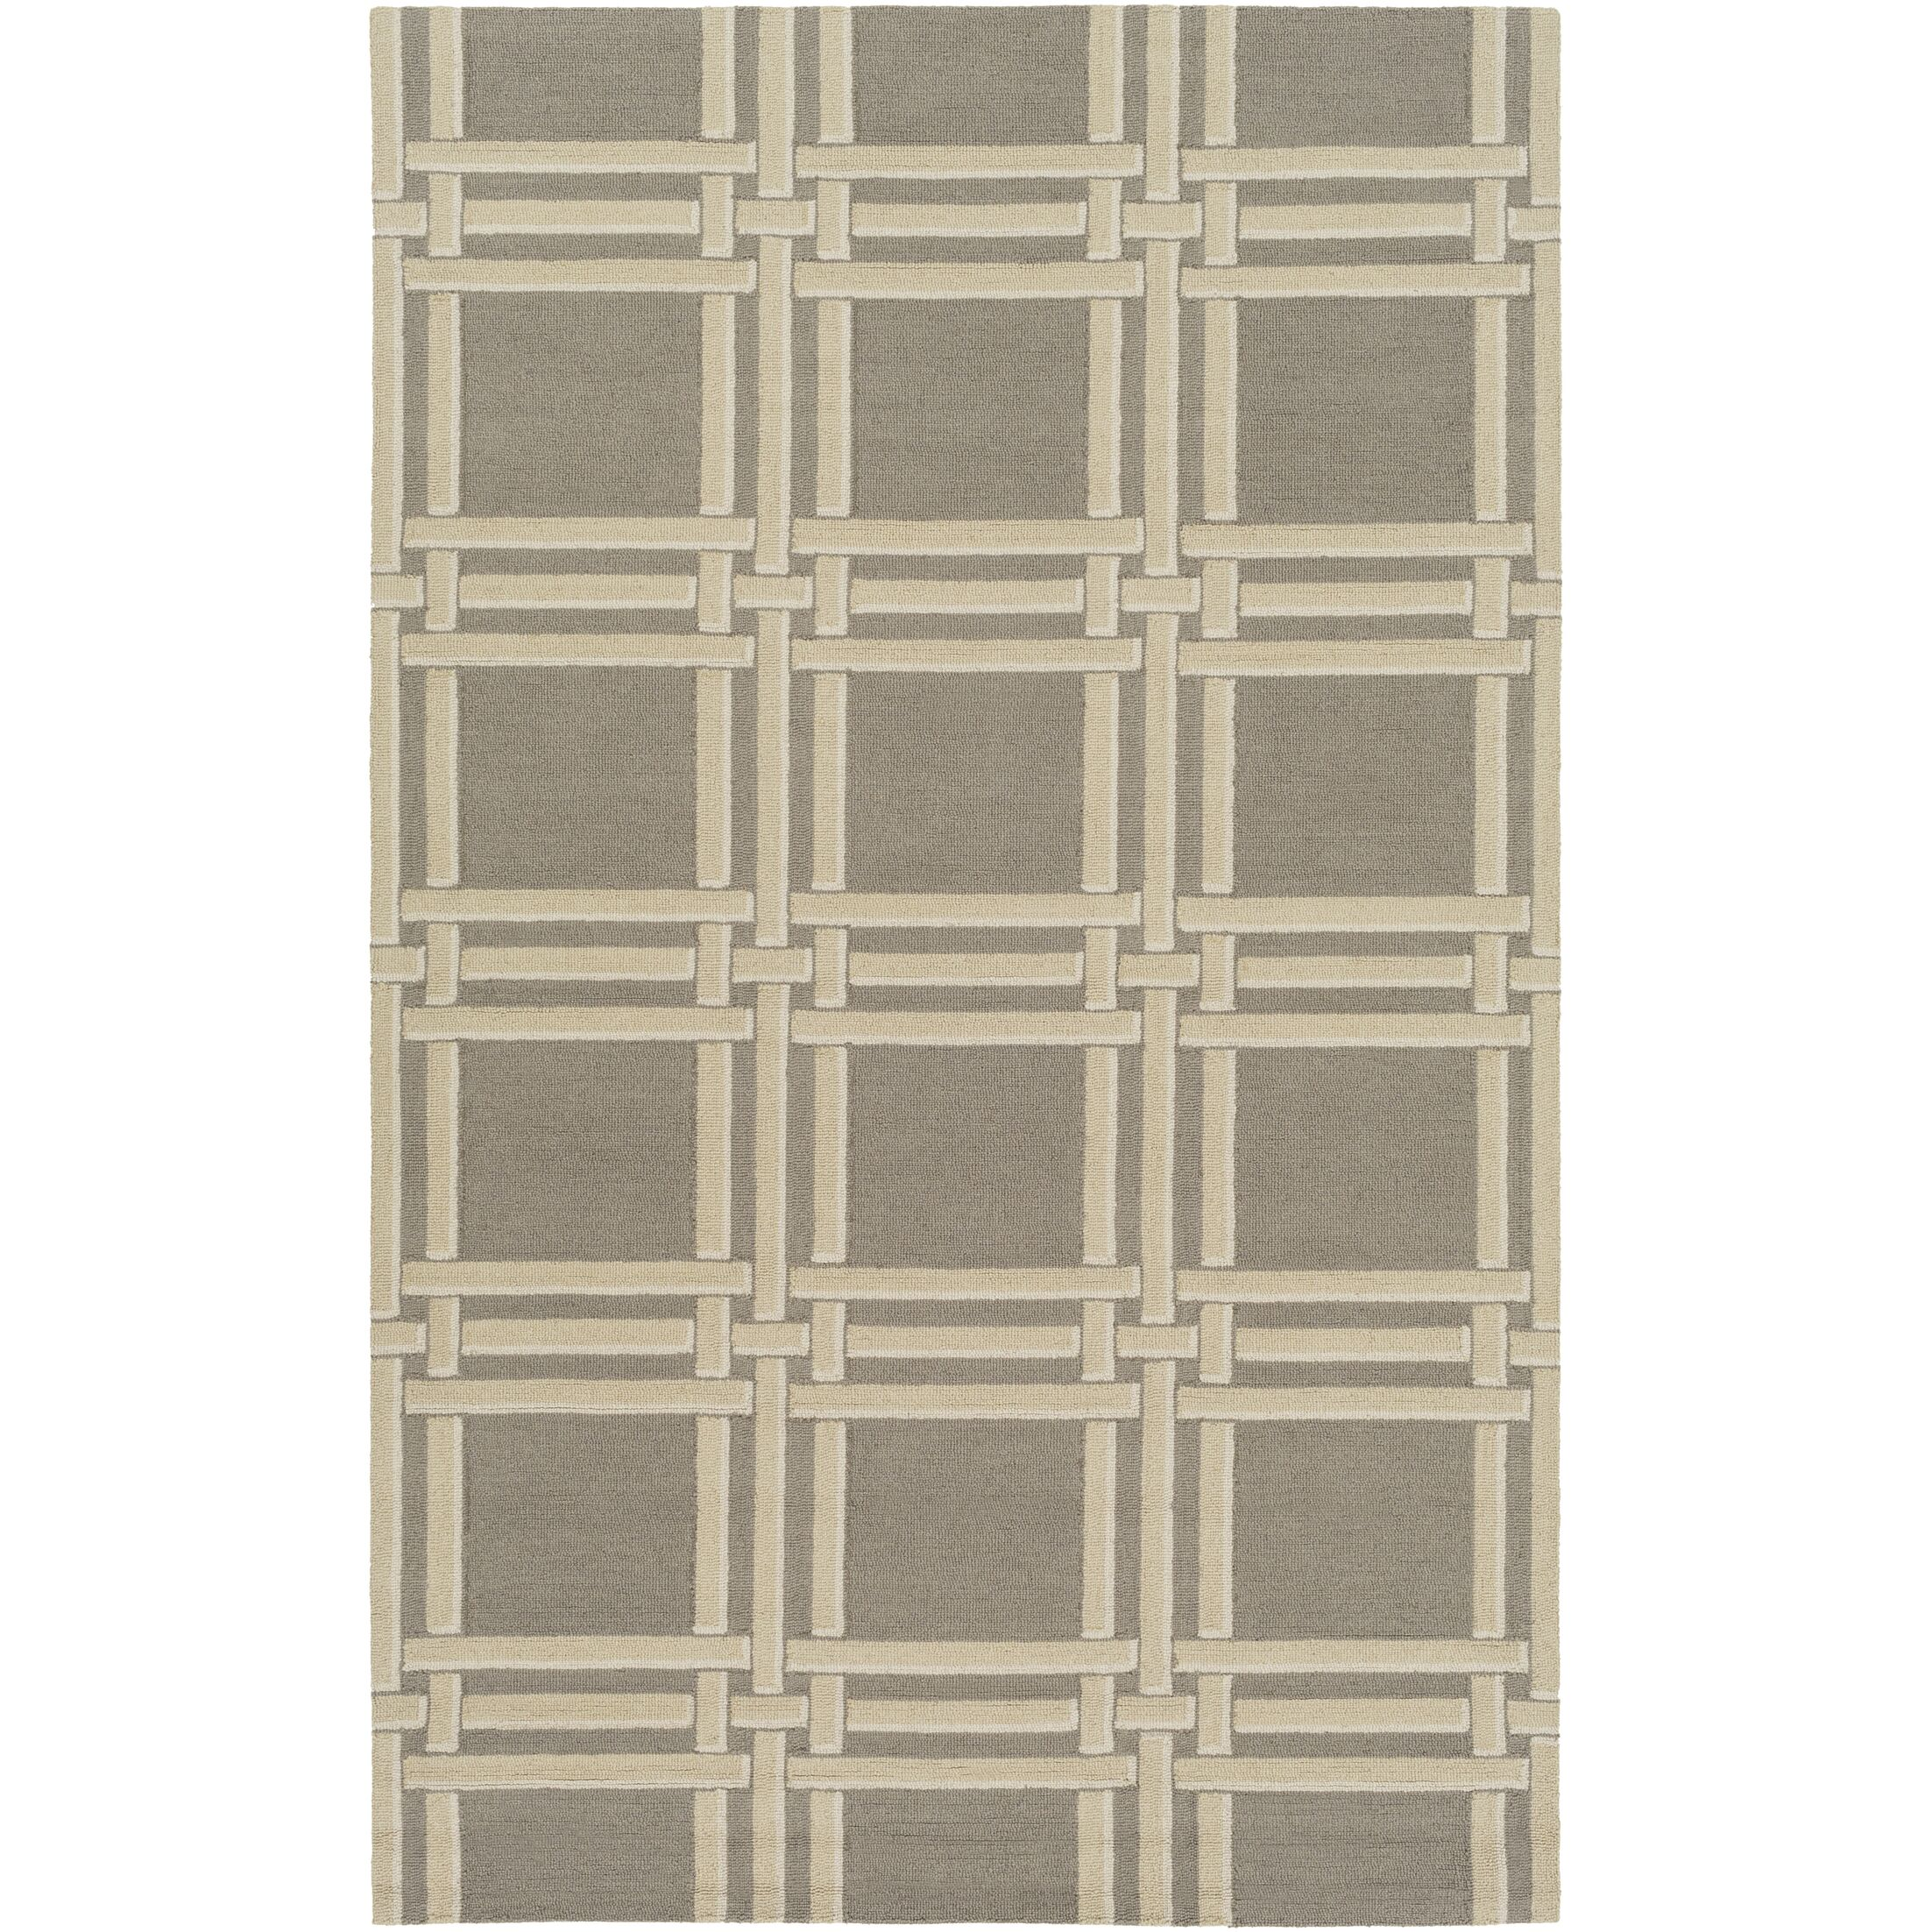 Abington Hand-Hooked Gray Area Rug Rug Size: Rectangle 8' x 10'